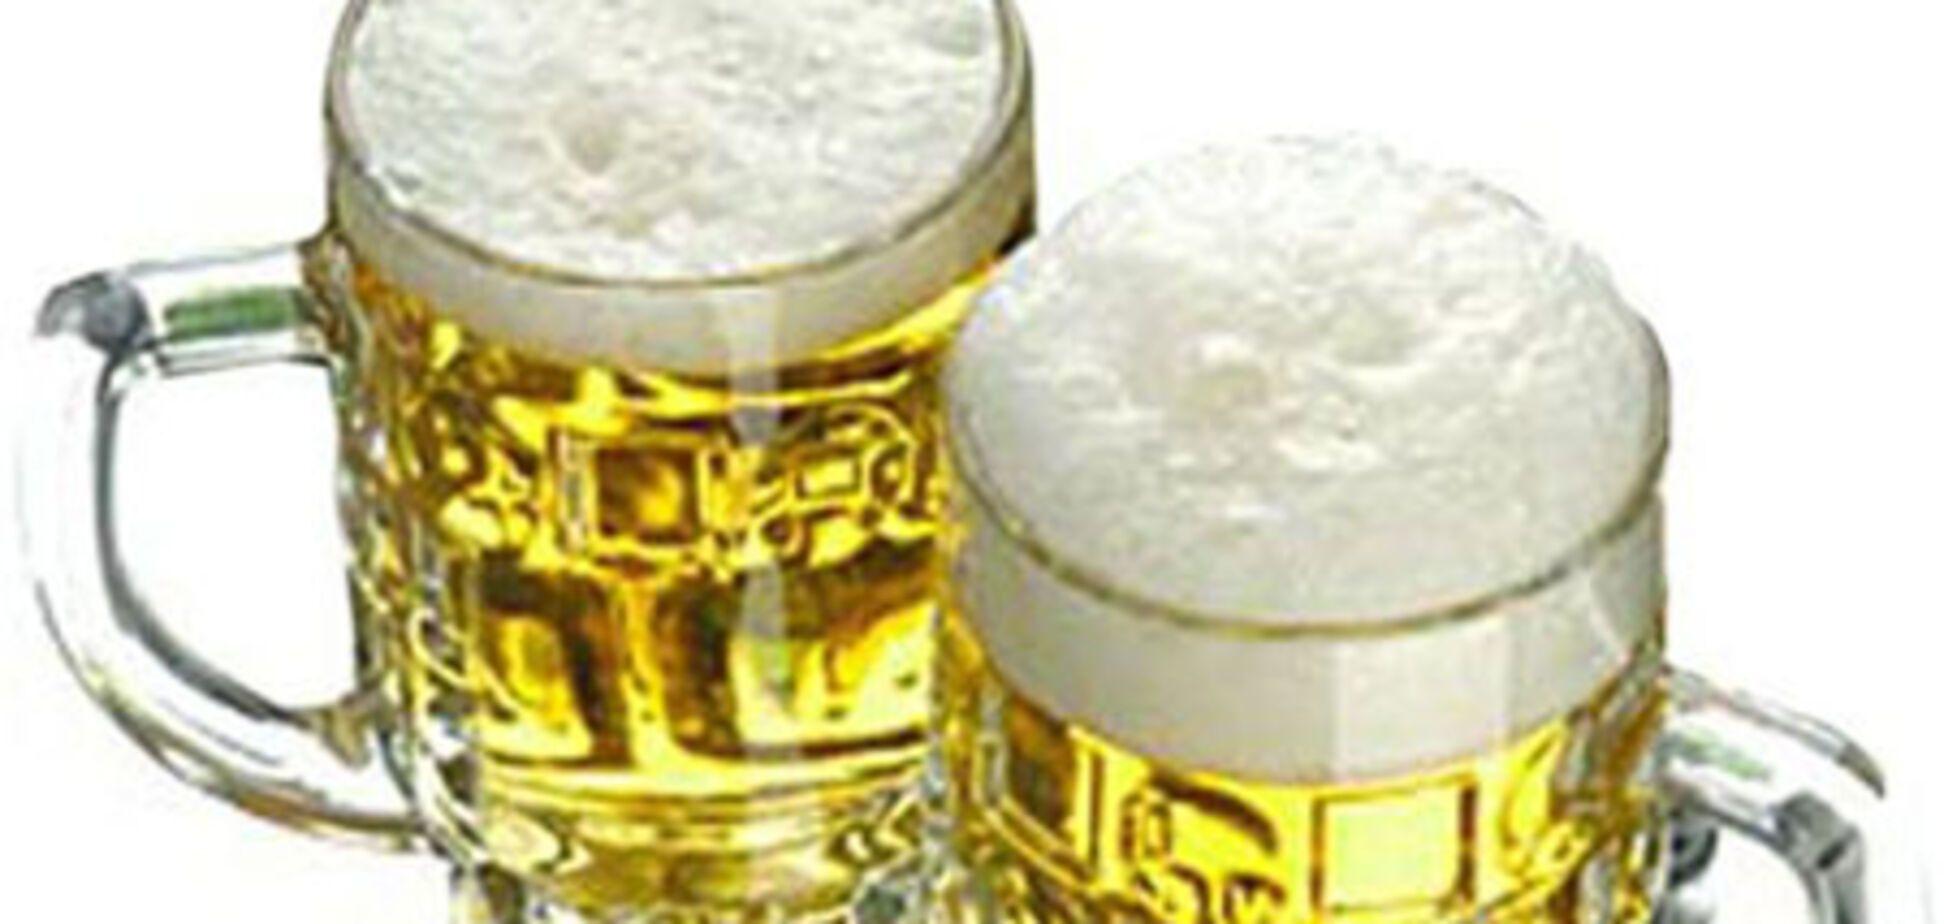 Білорусь залишилася без українського пива